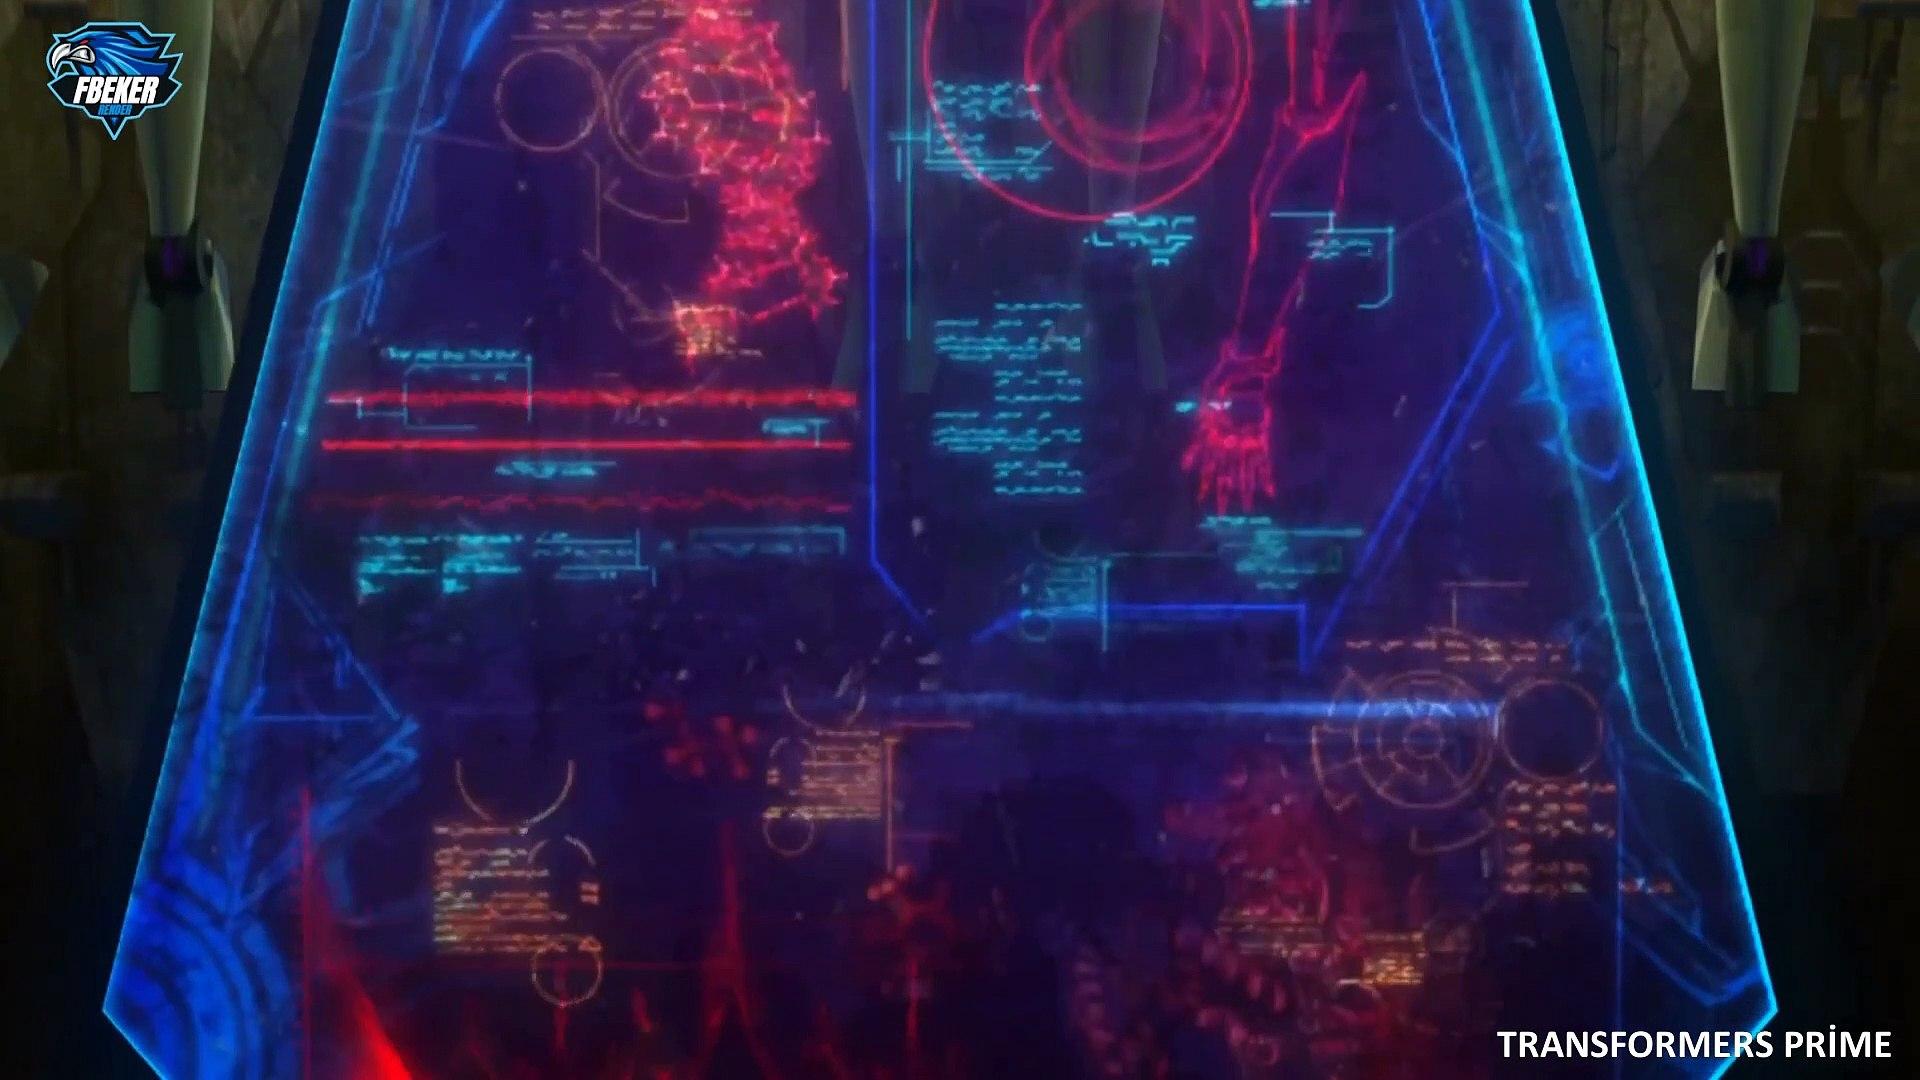 Transformers Prime 36.Bölüm Donanma Full Hd